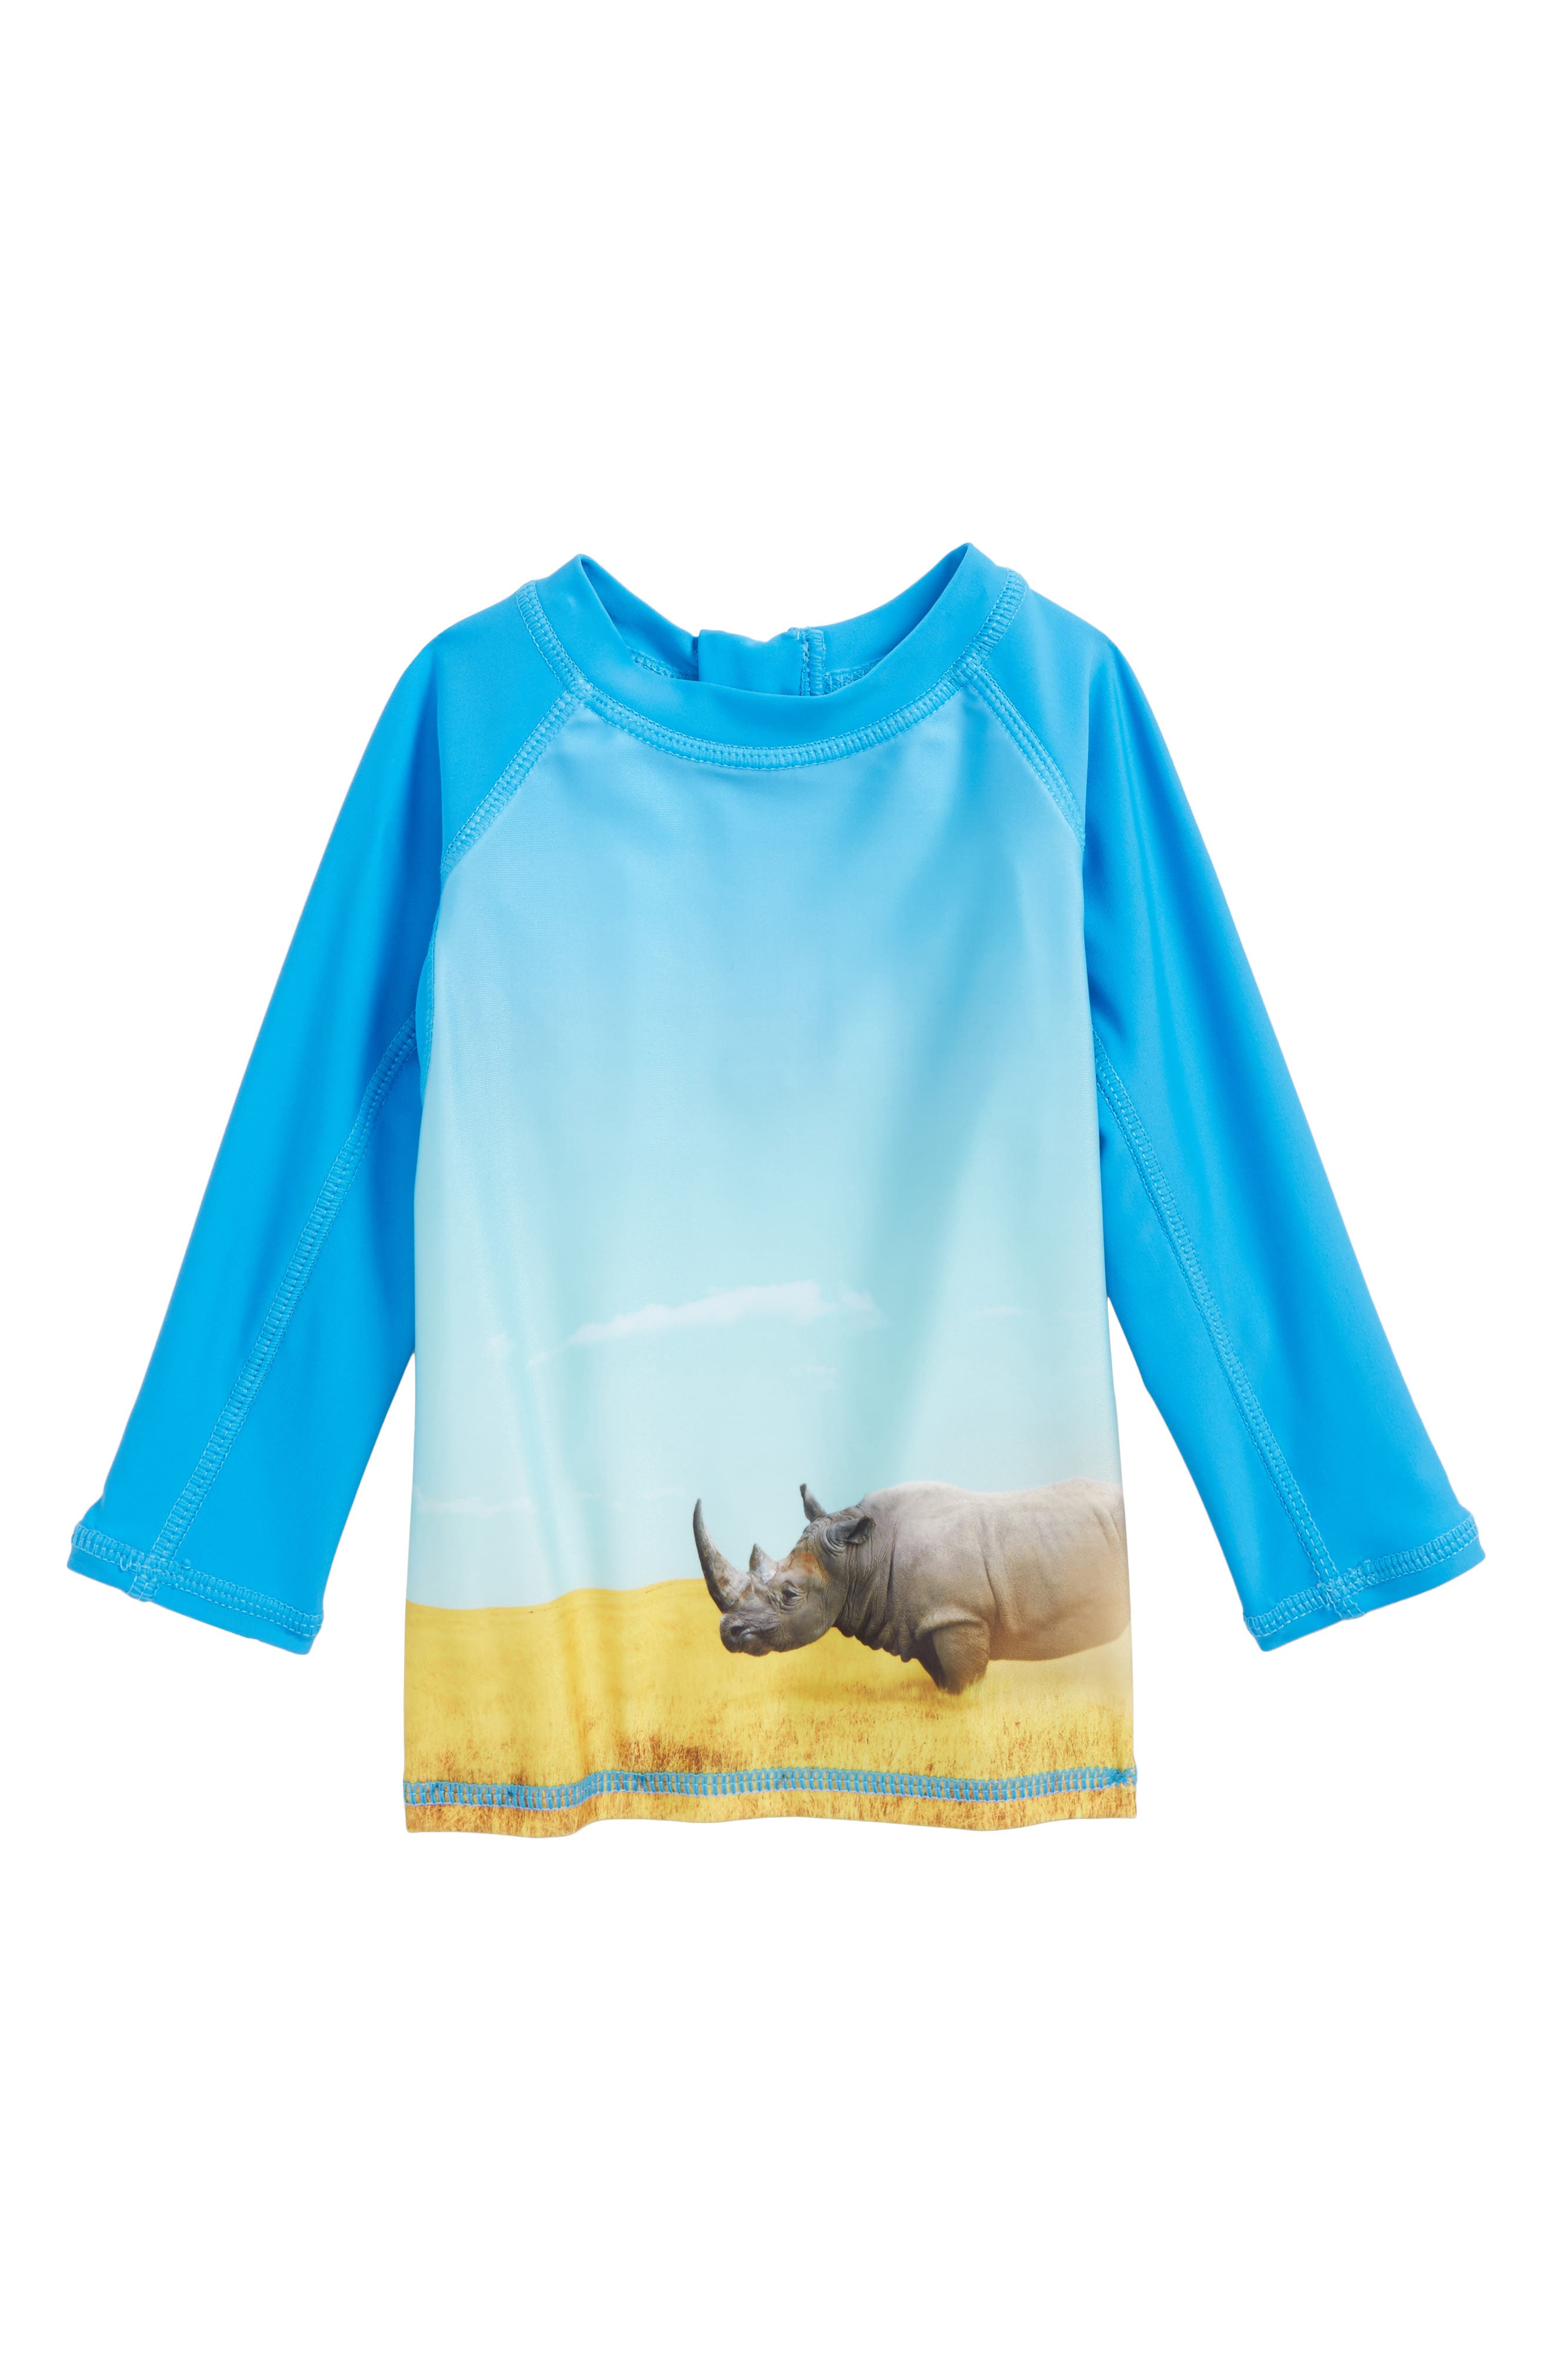 Alternate Image 1 Selected - Molo Nemo Long Sleeve Rashguard Vest (Baby Boys)